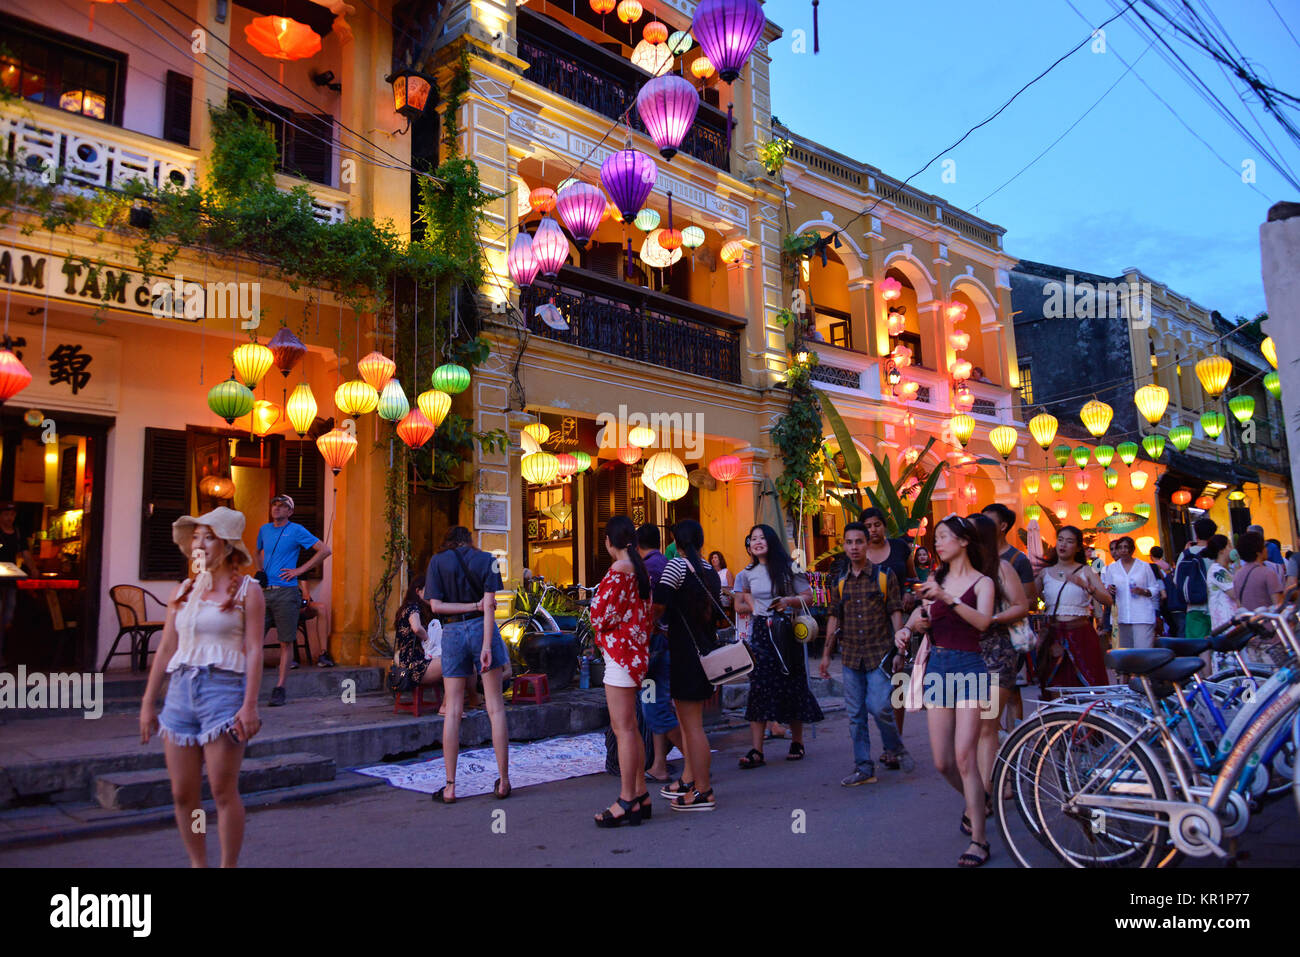 Tourists, Nguyen Thai Hoc, Hoi In, Vietnam, Touristen, Hoi An - Stock Image